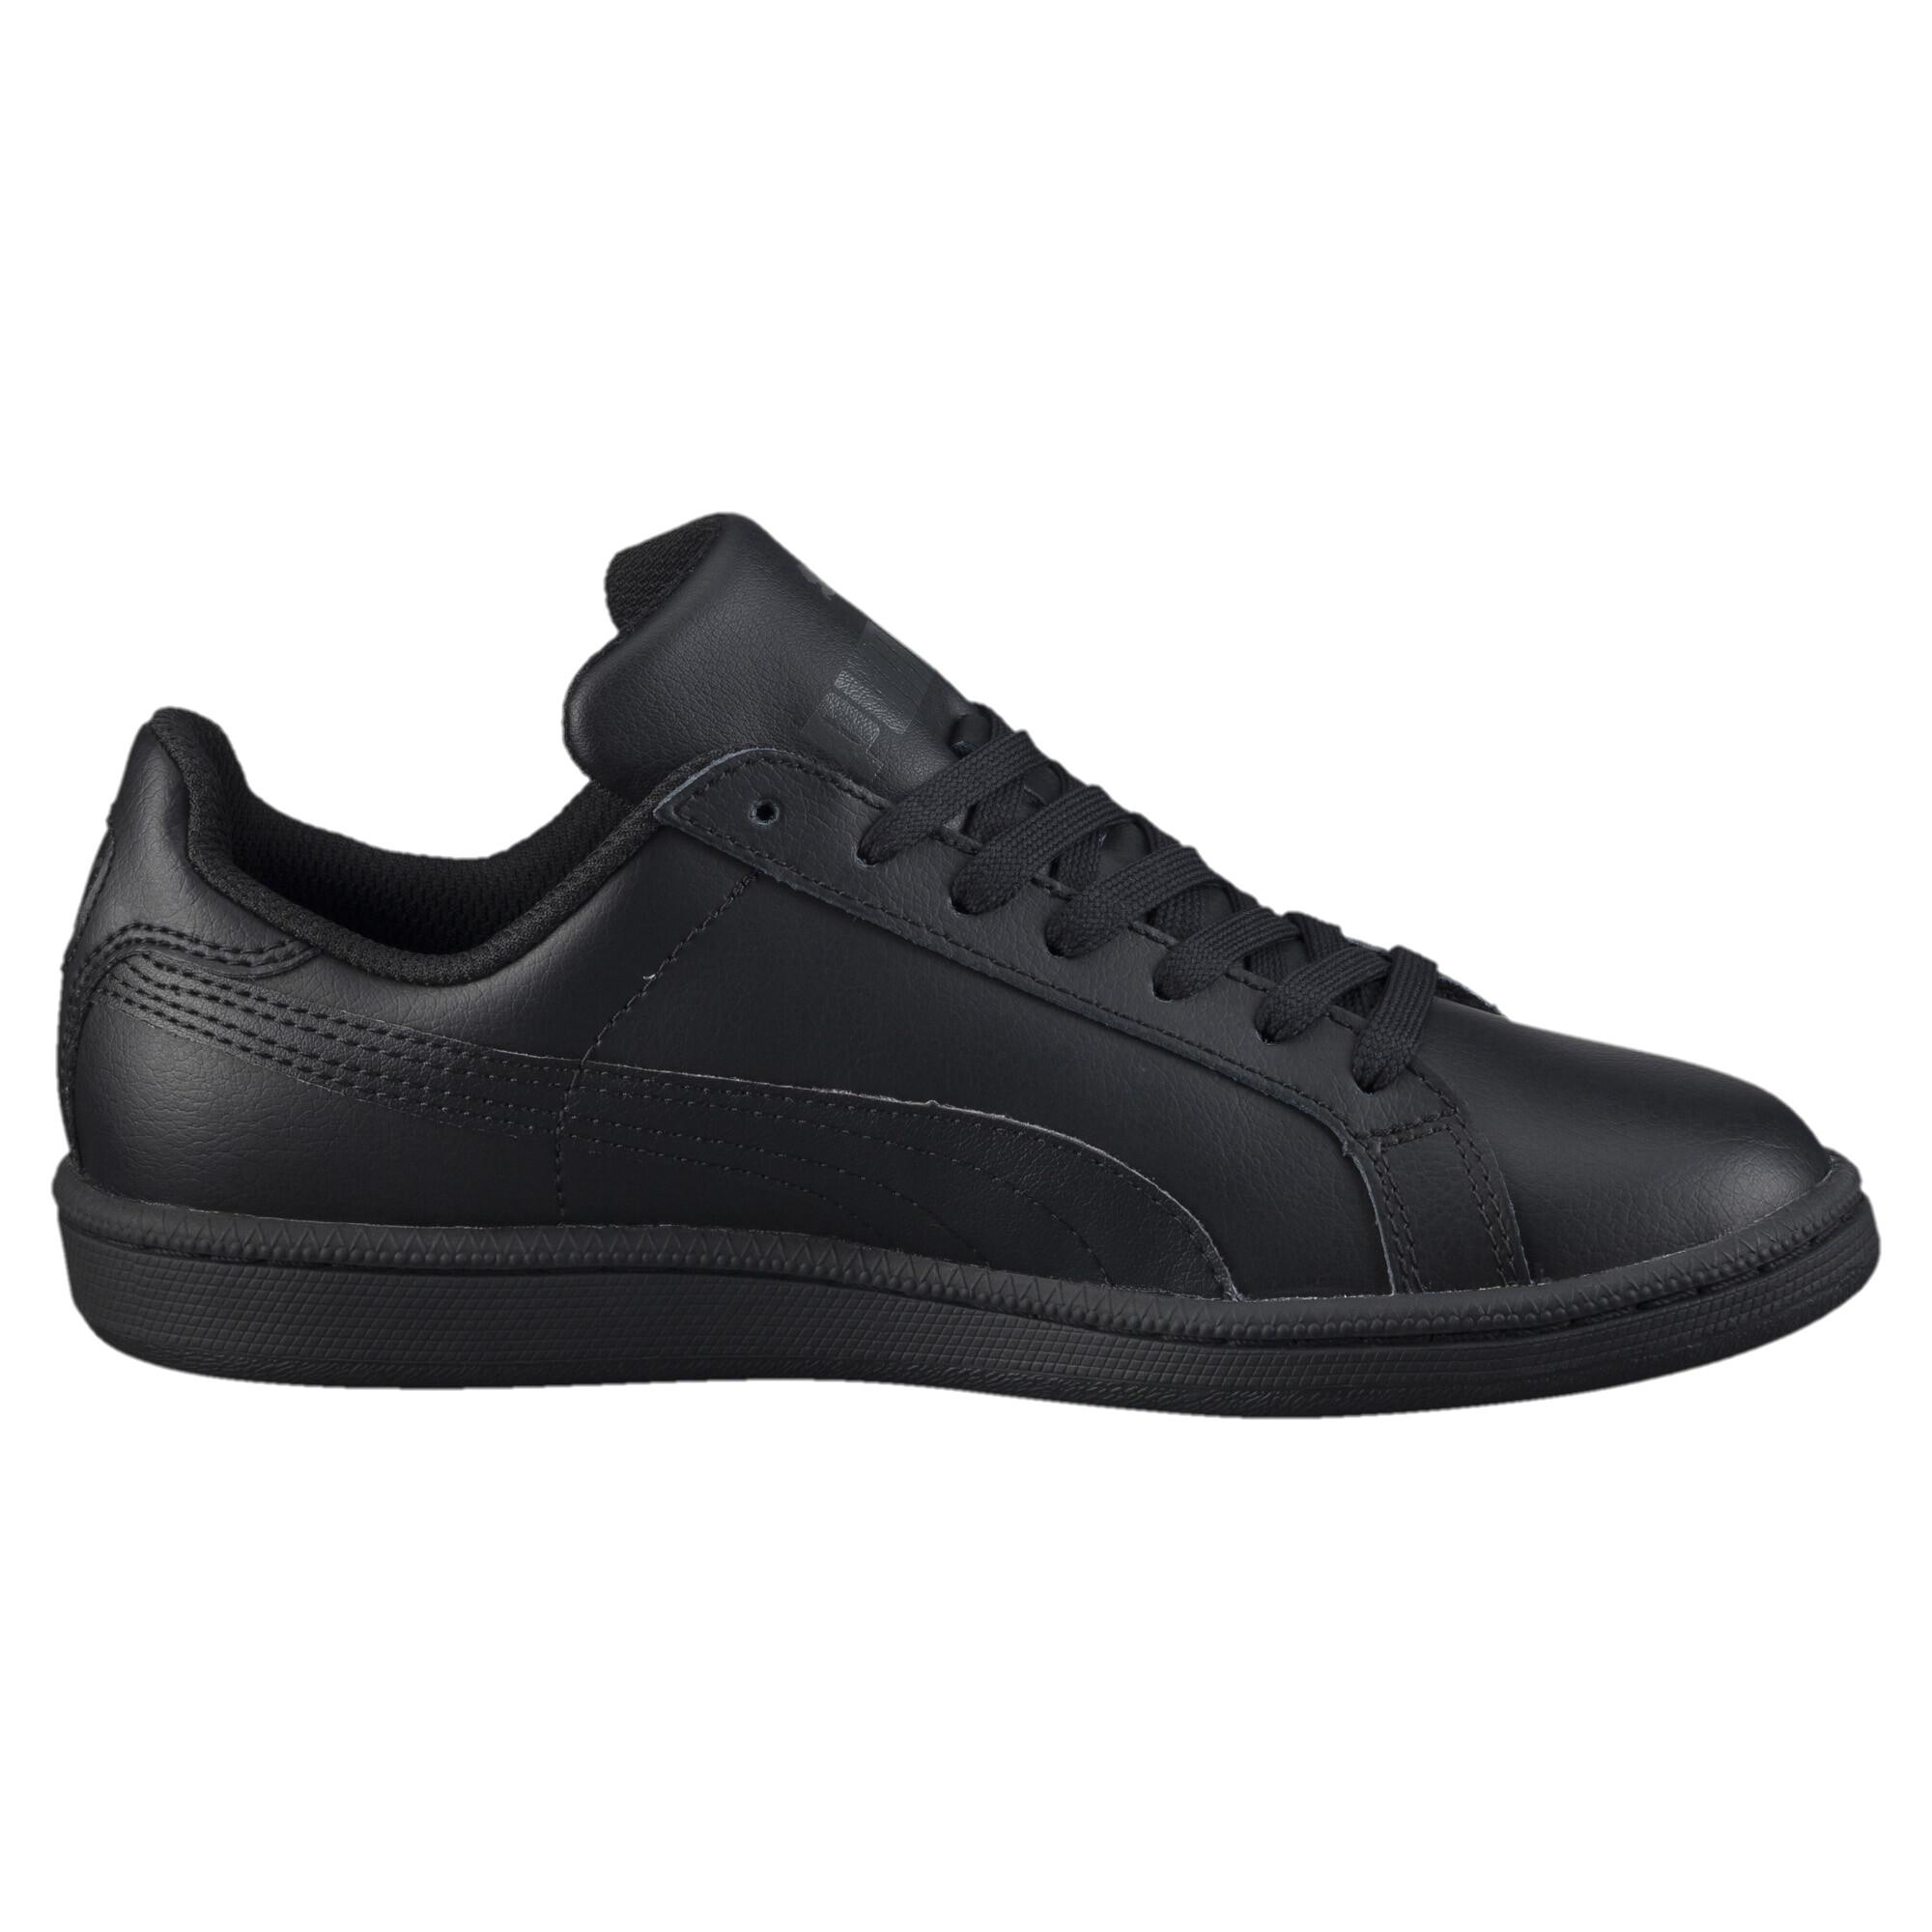 PUMA-Smash-Jr-Sneaker-Unisex-Schuhe-Kinder-Neu Indexbild 5